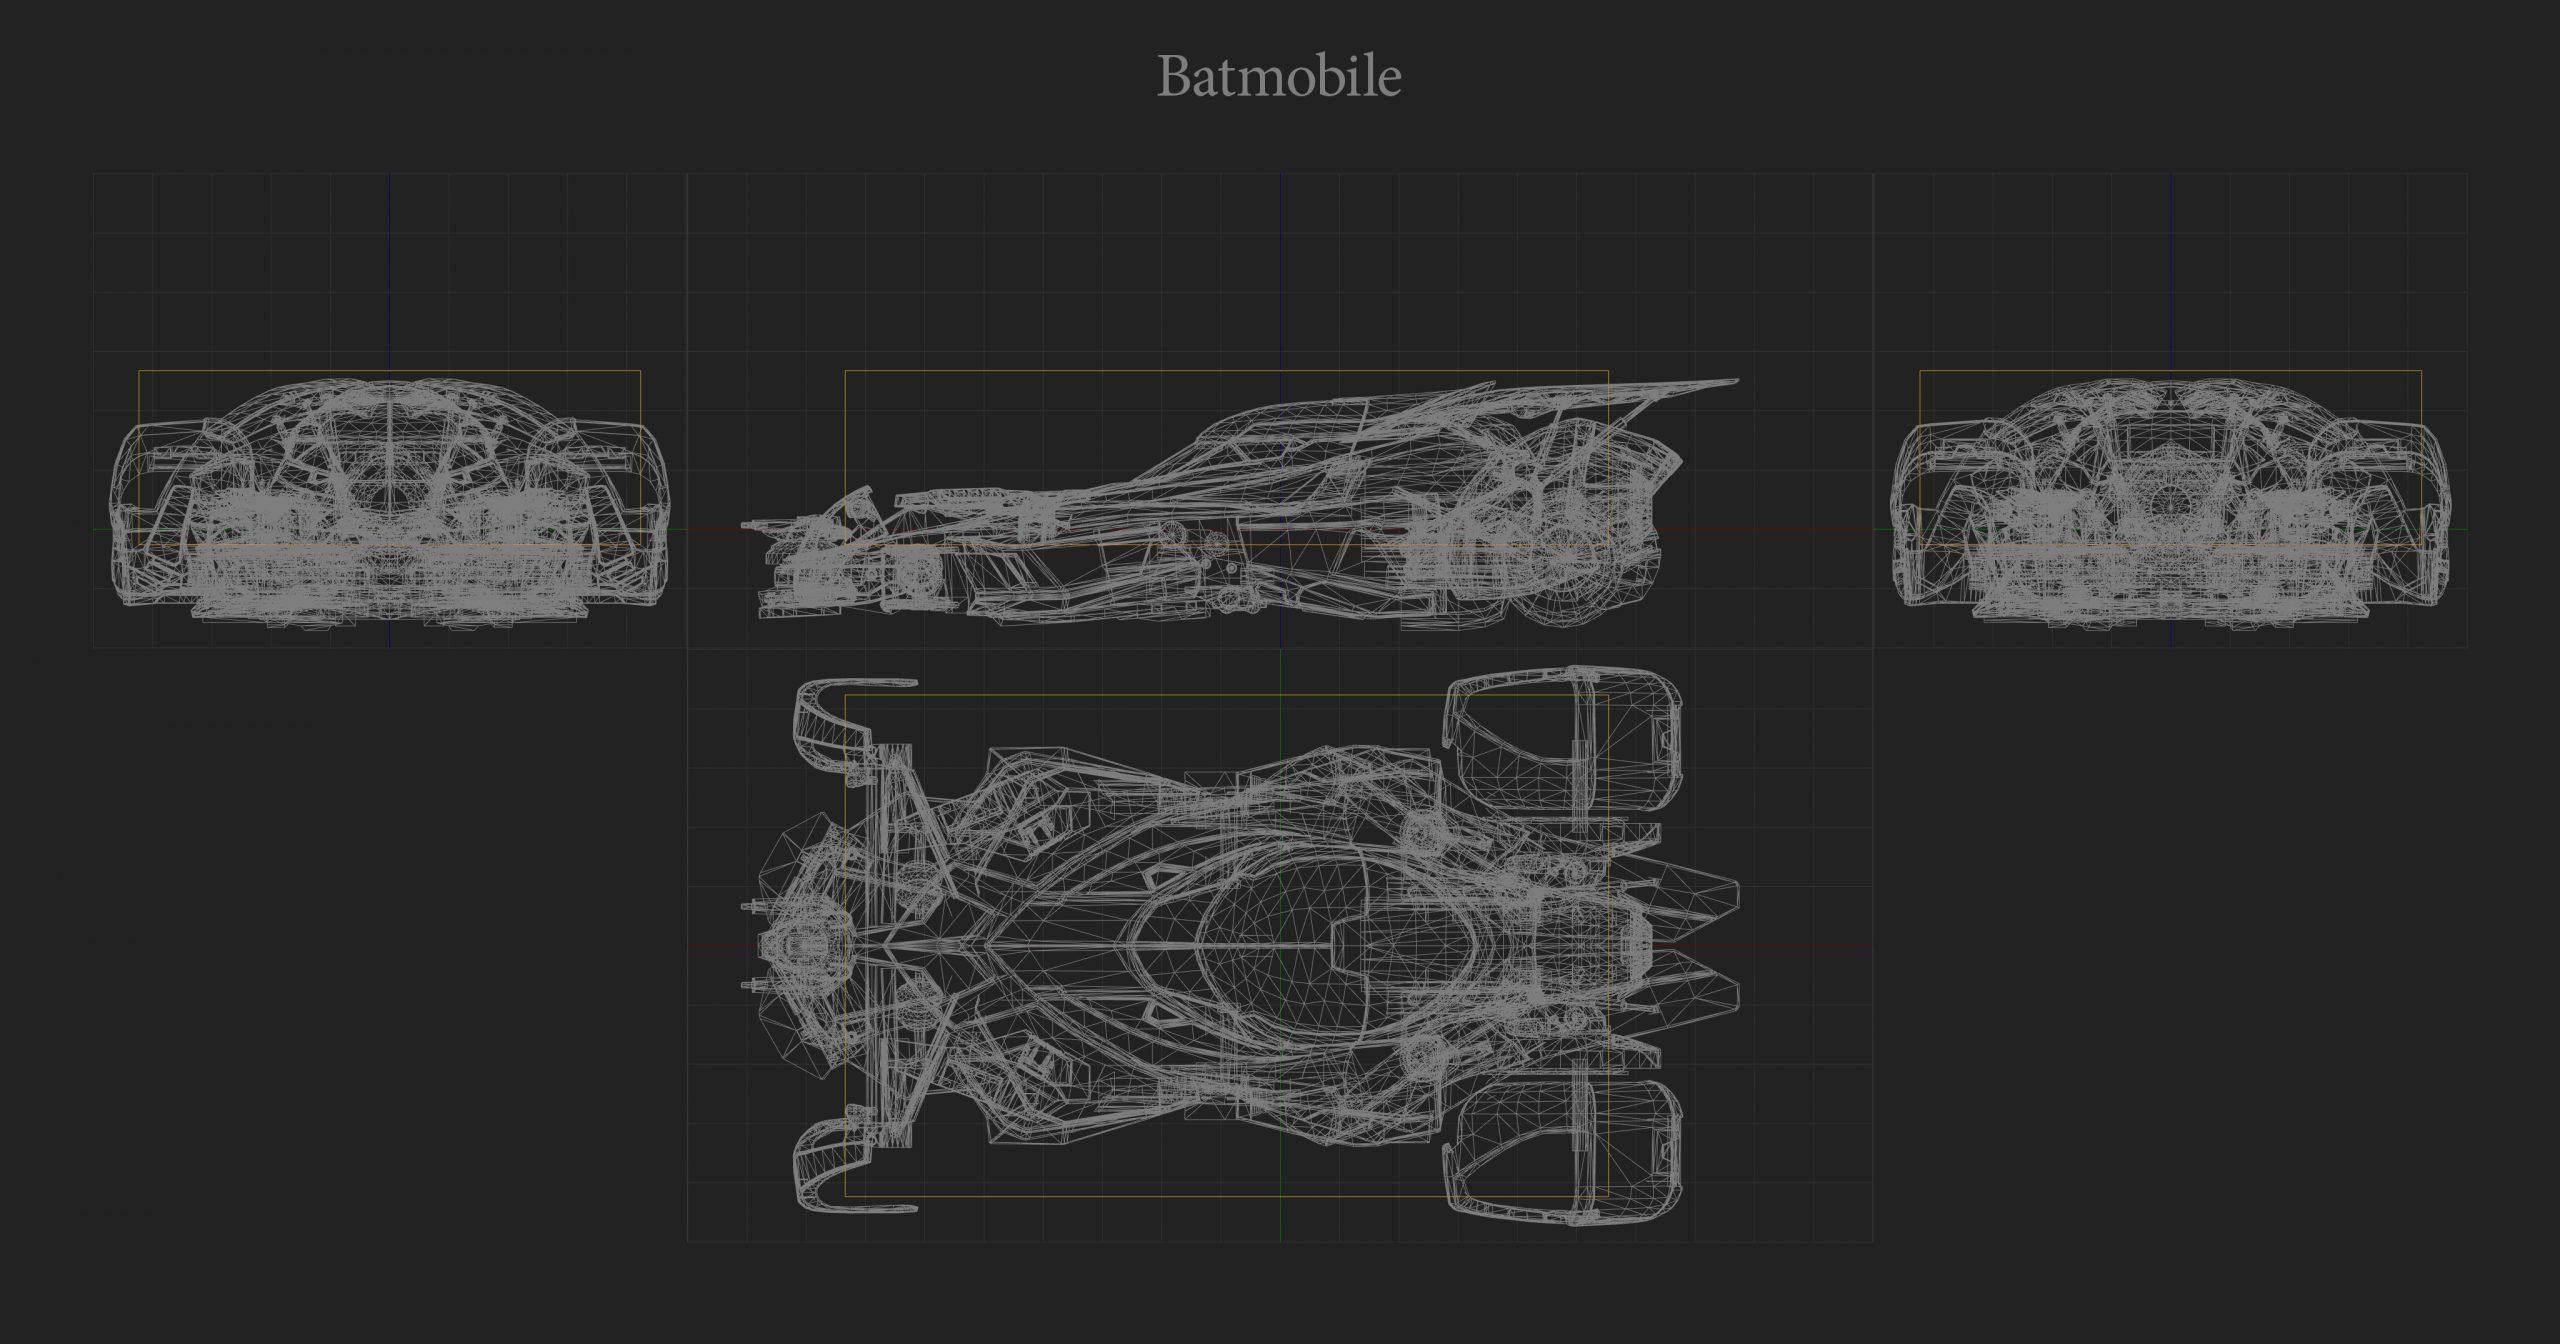 Batmobile Hitbox Rocket League